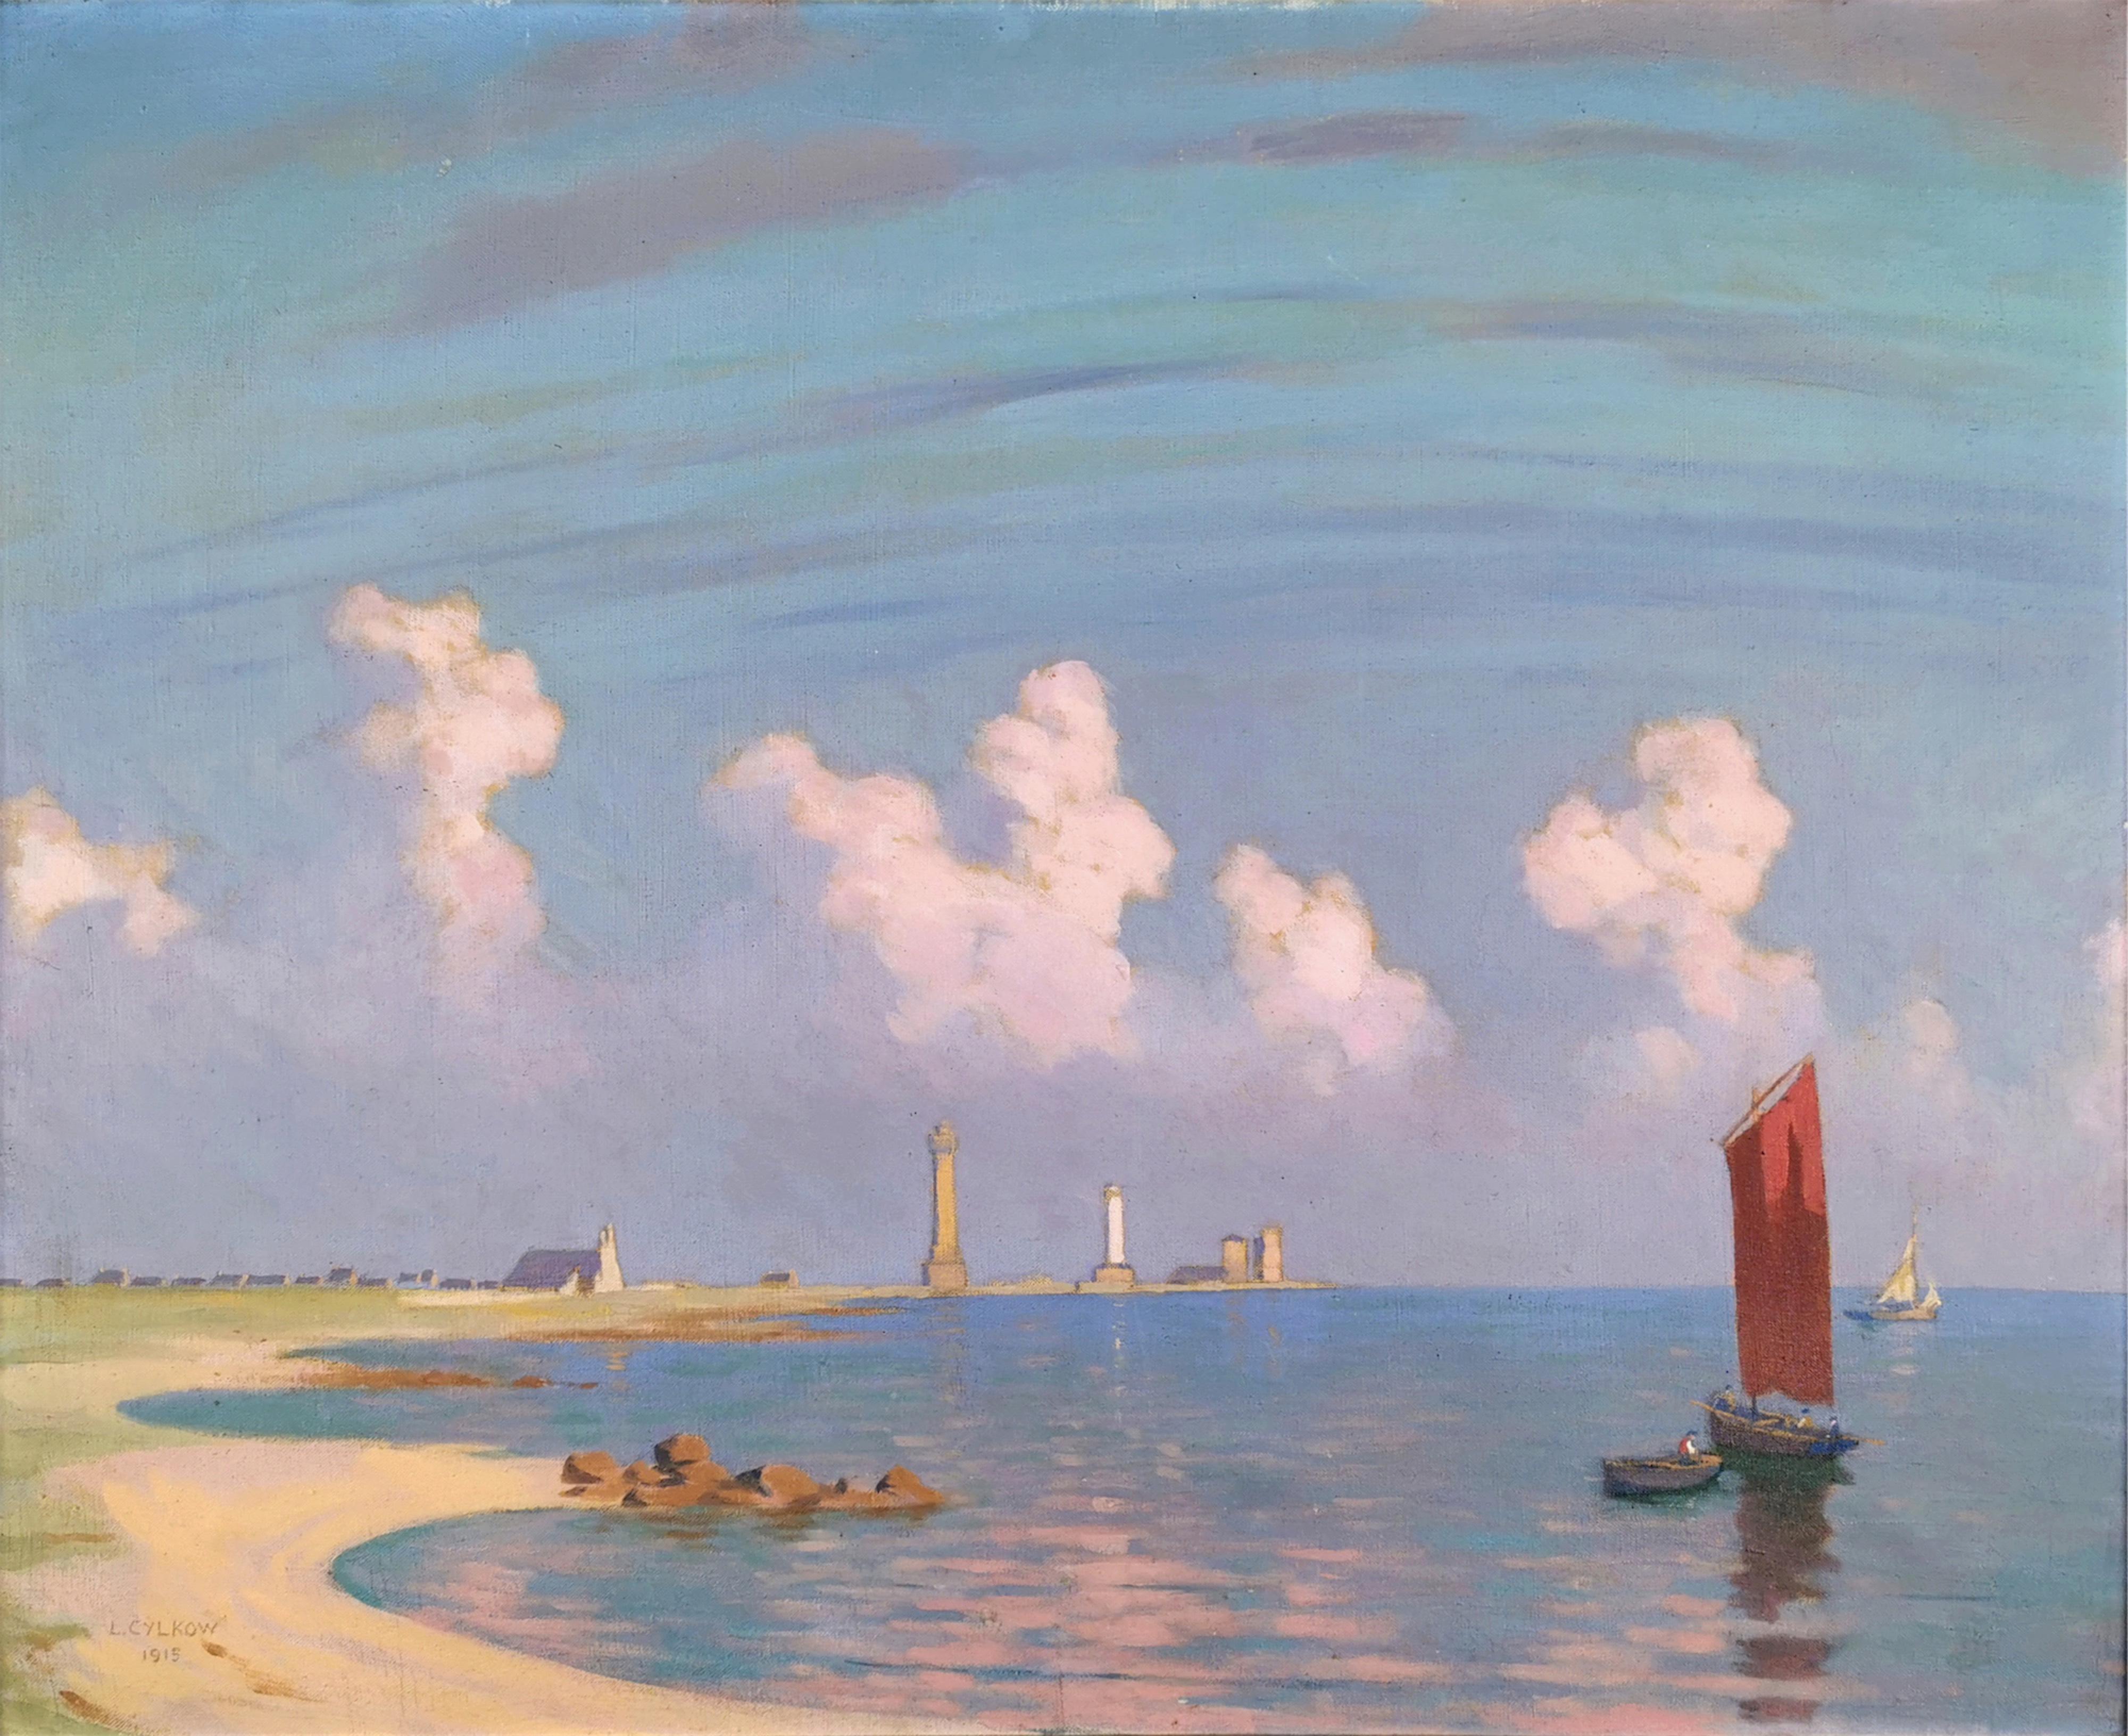 Pejzaż z łódkami, 1915